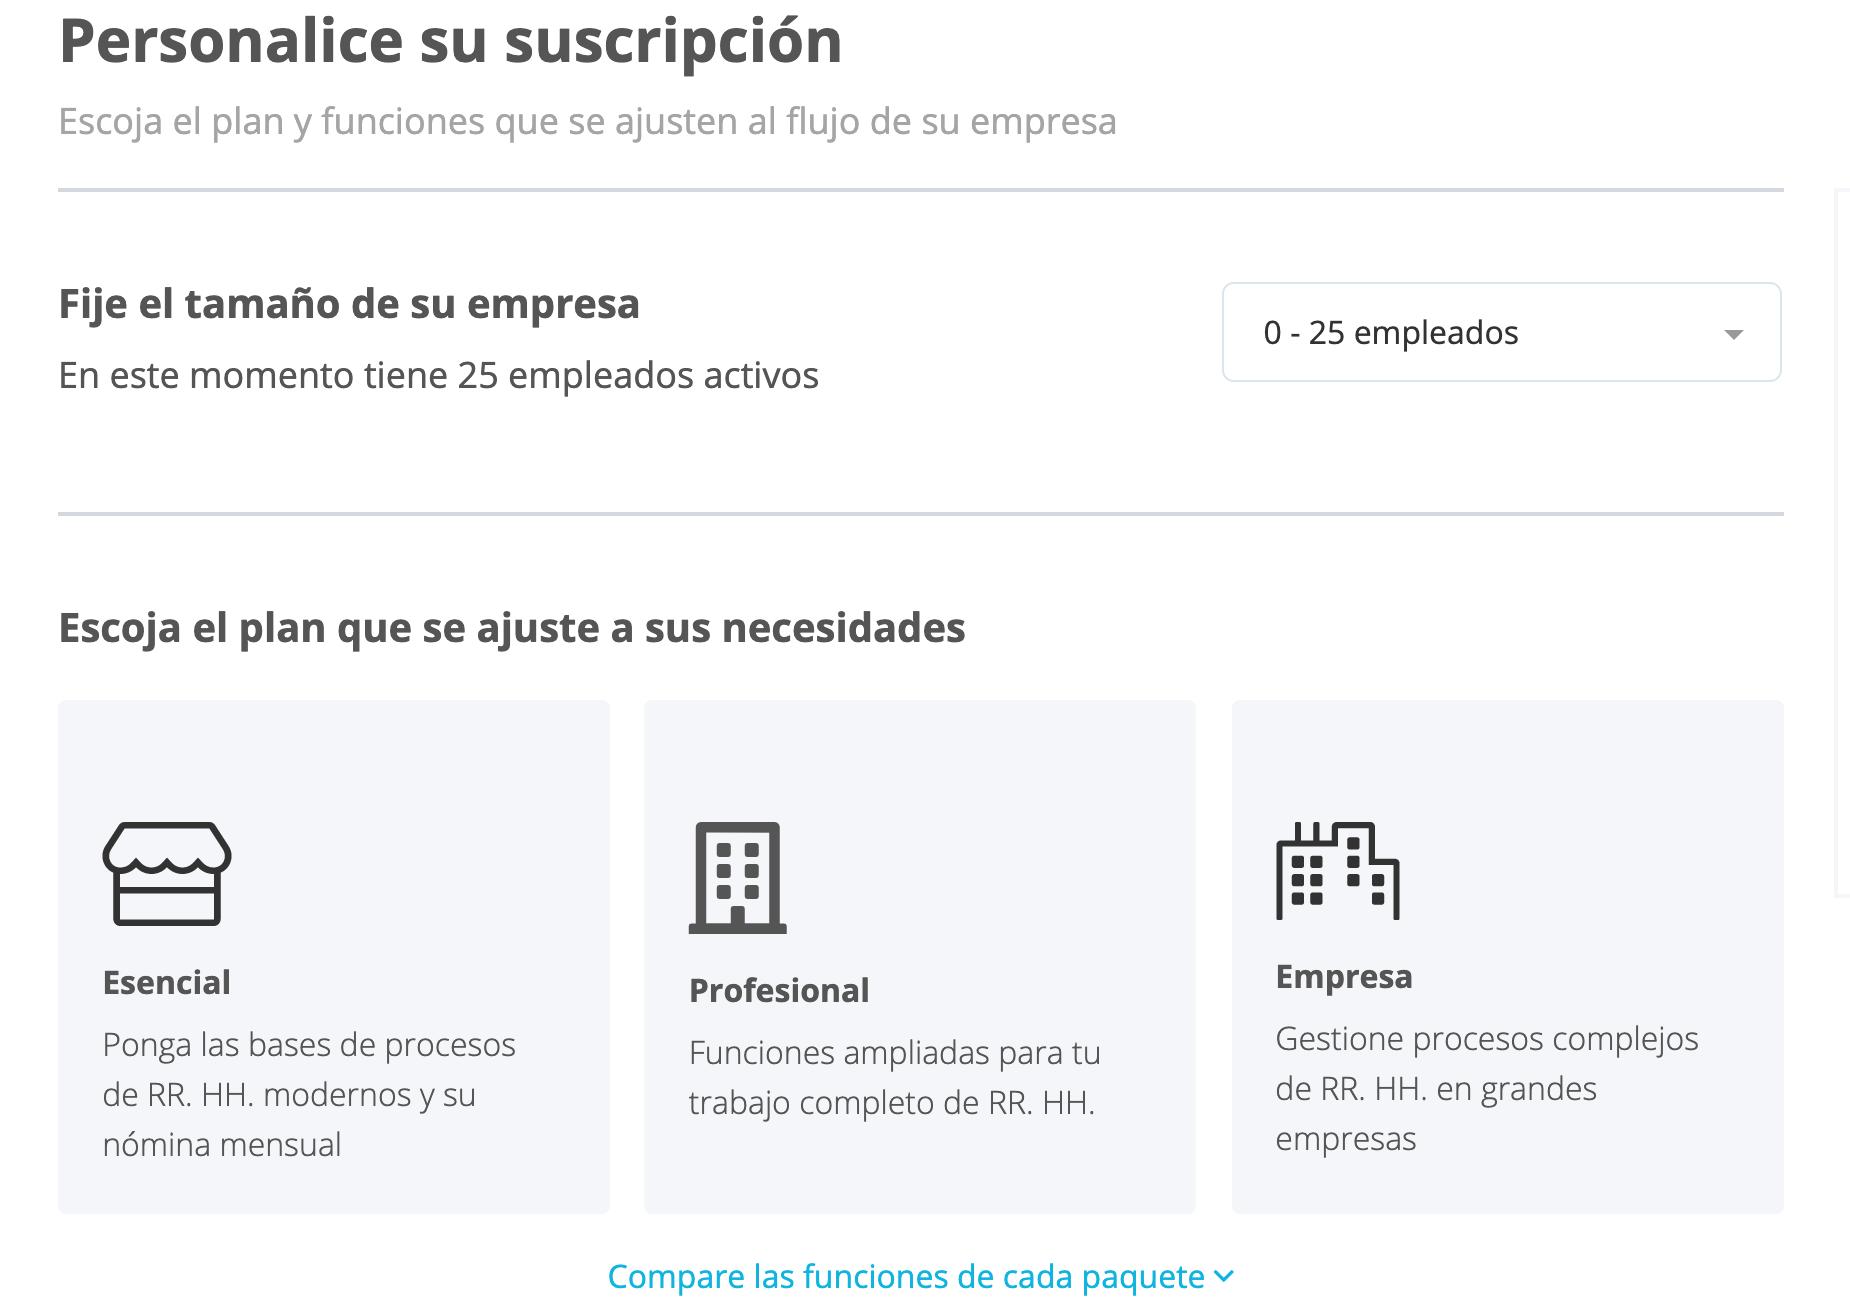 choosing-plans-customize-subscription_es.png